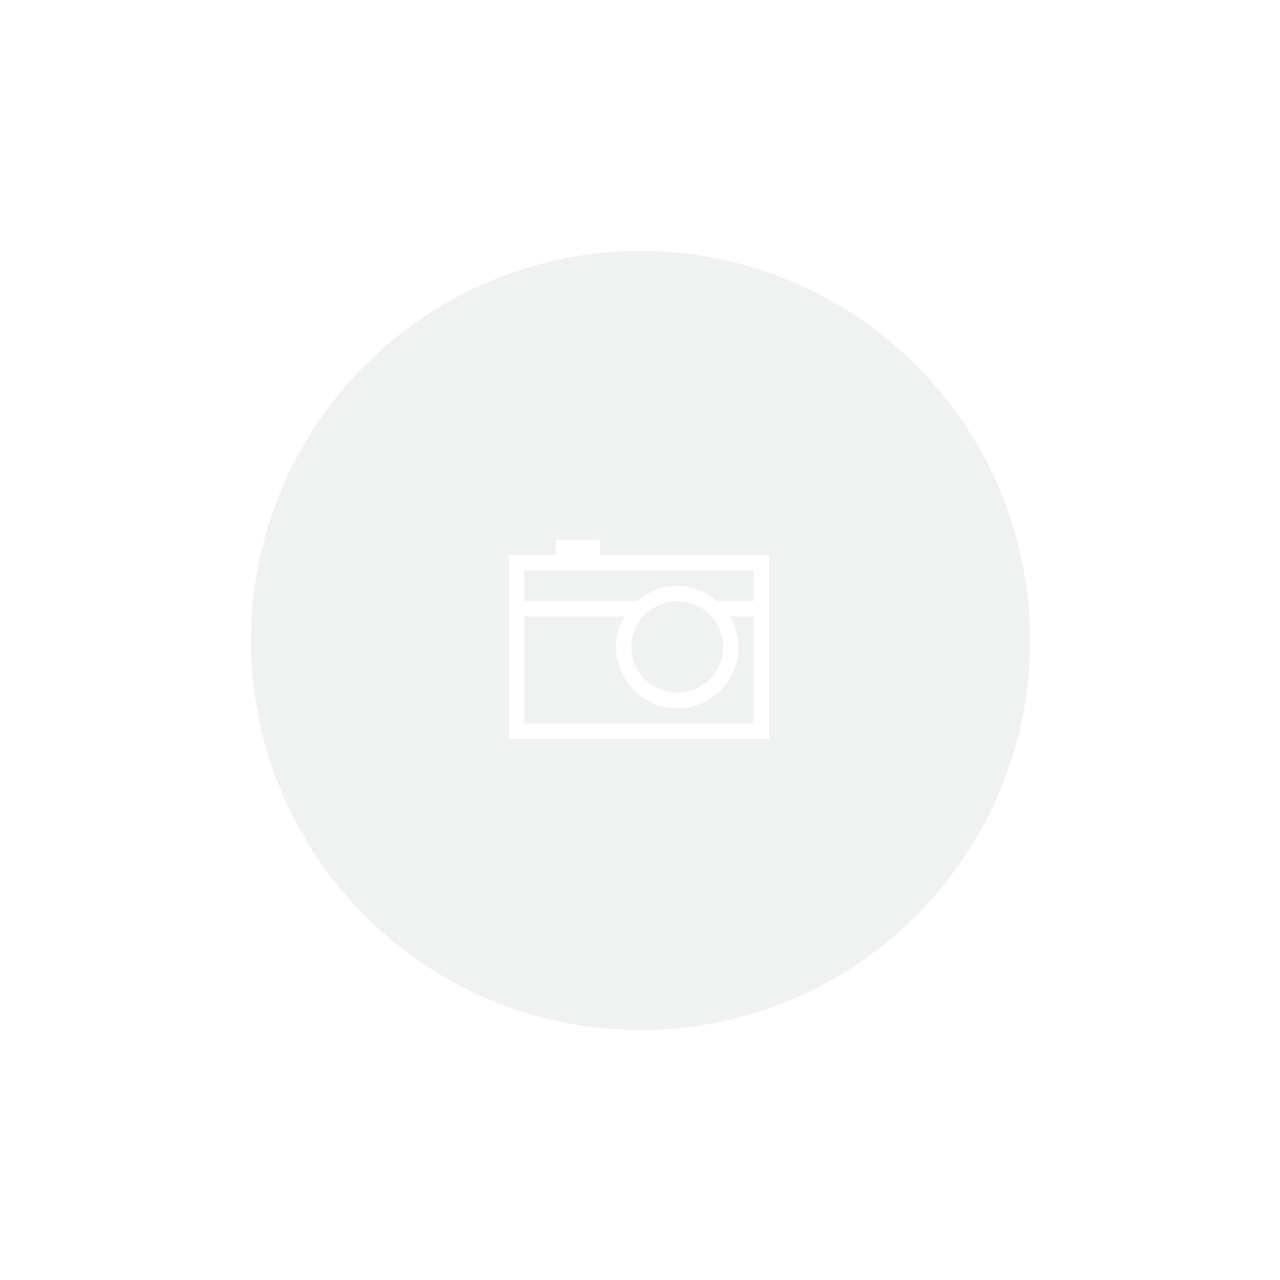 Assadeira Rasa Retangular 22 cm Antiaderente Tramontina